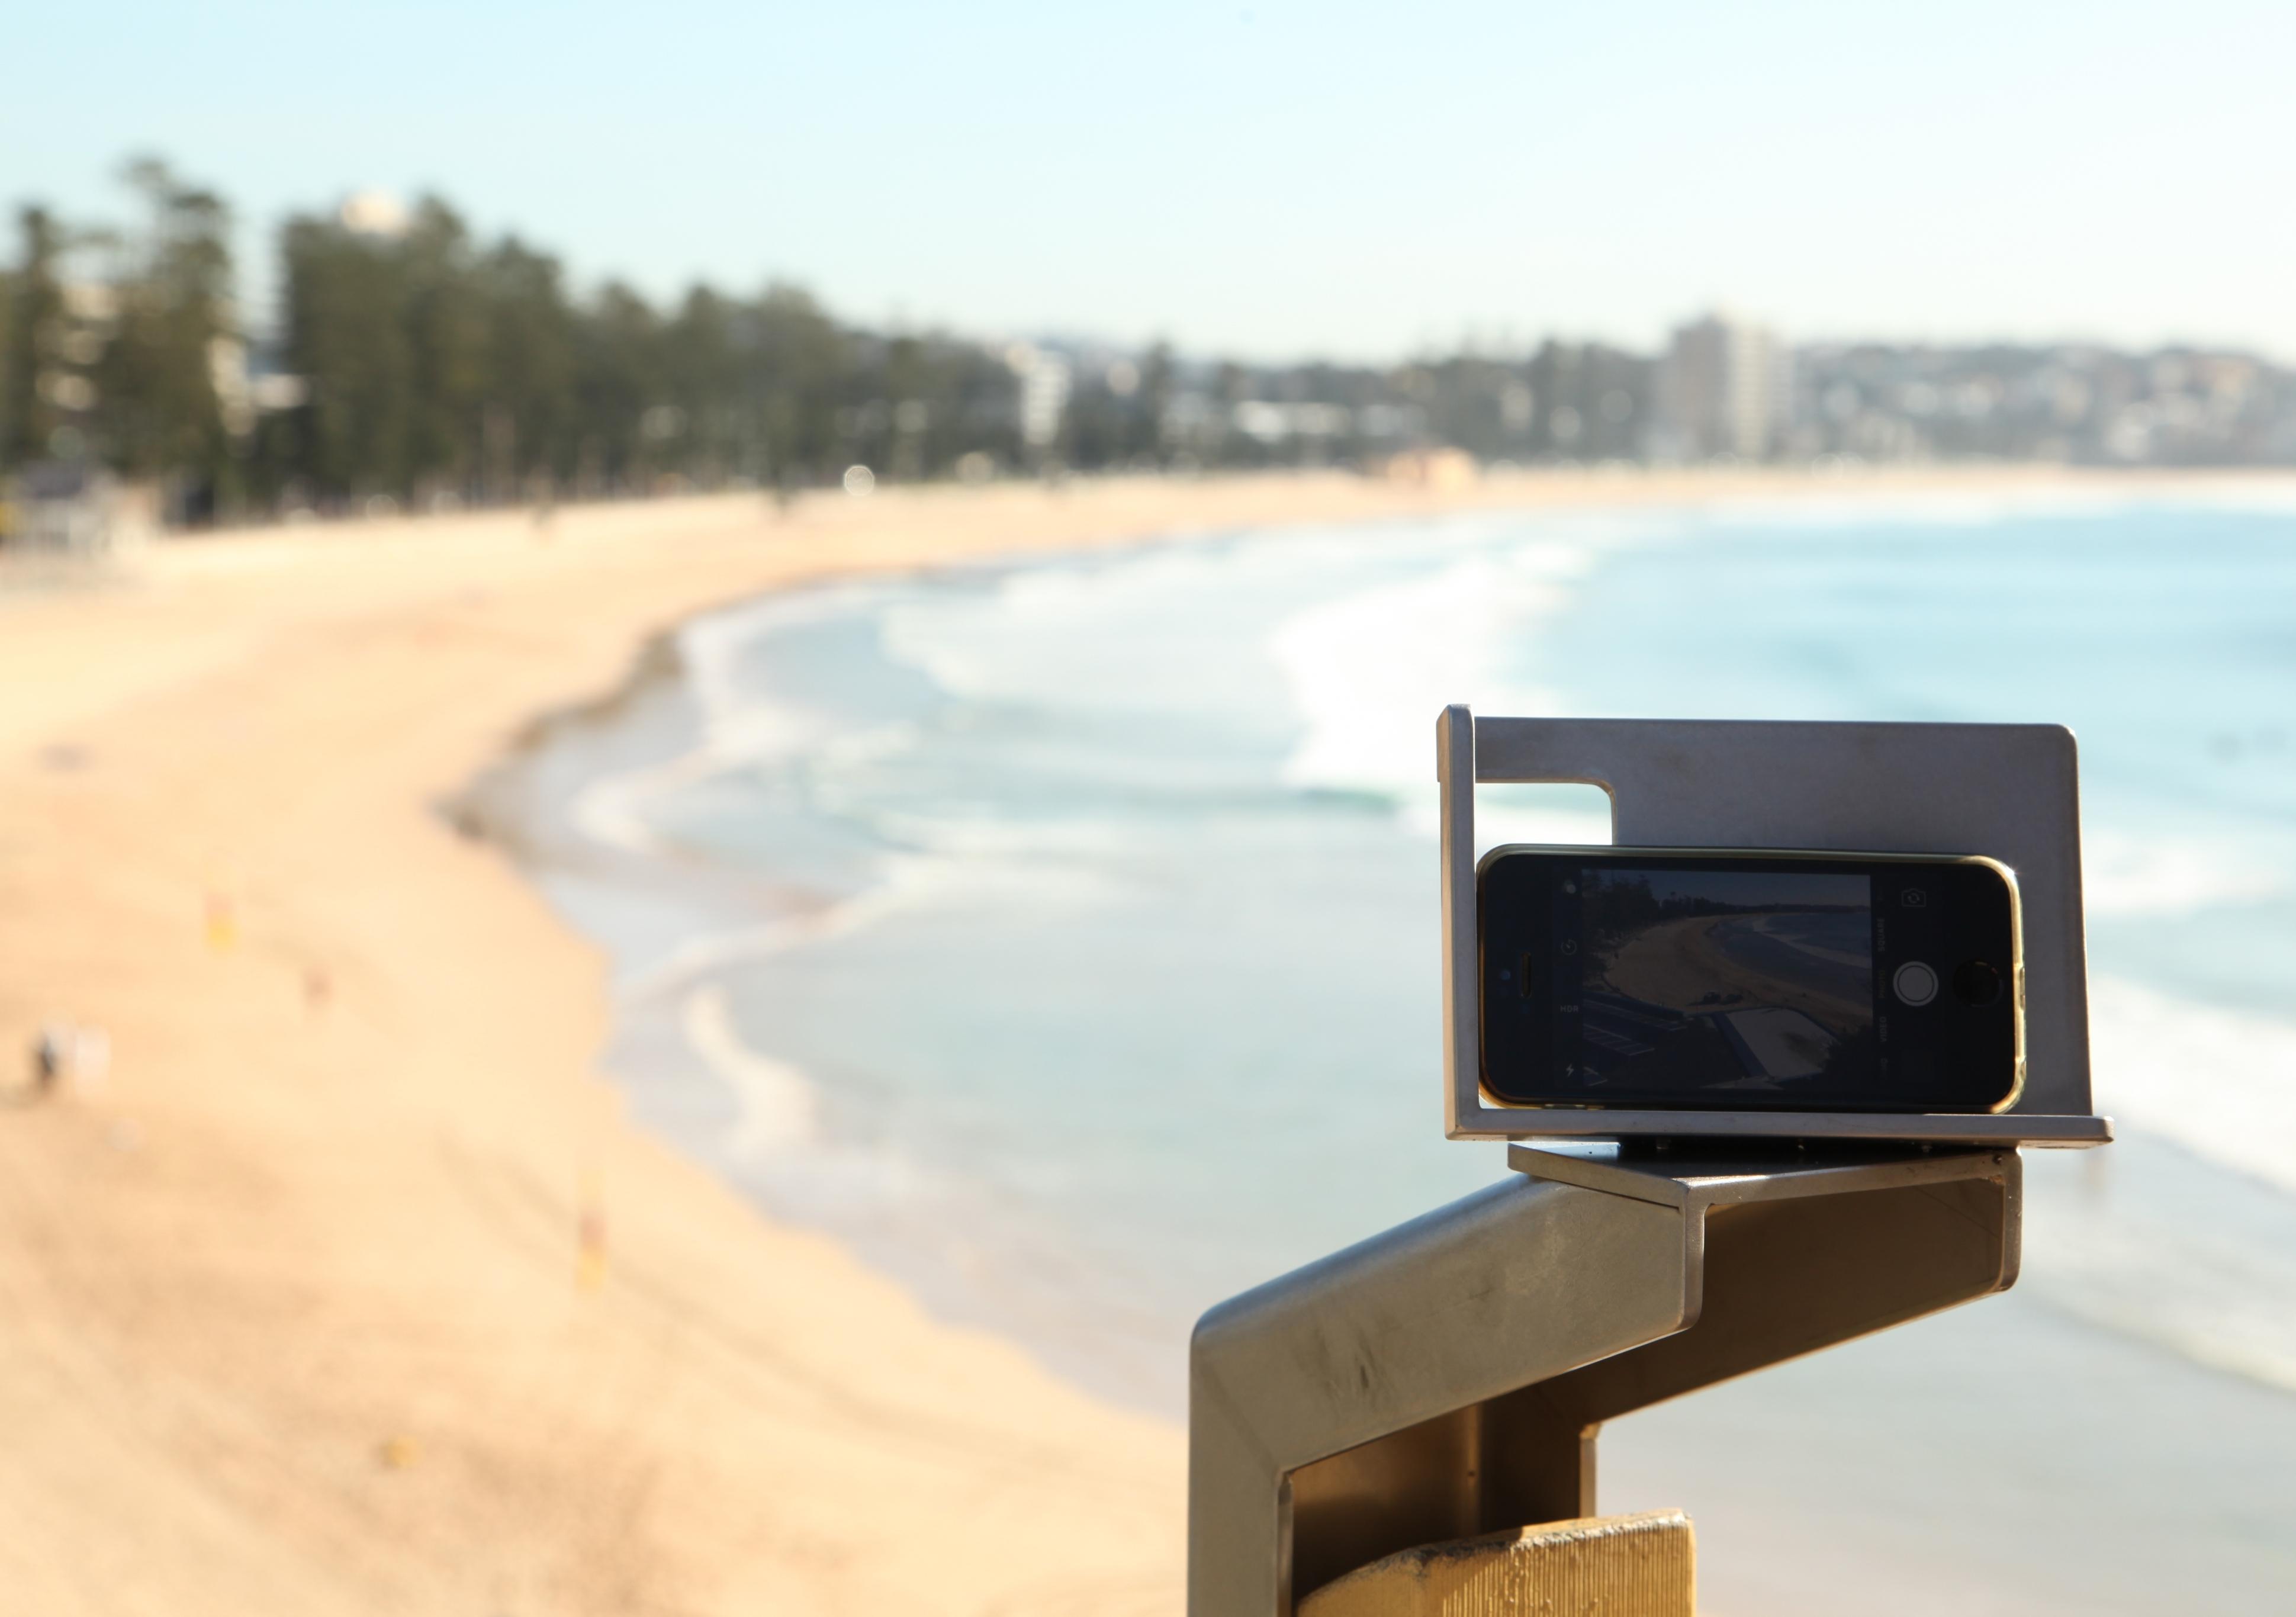 Revolutionising coastal monitoring, one social media photo at a time